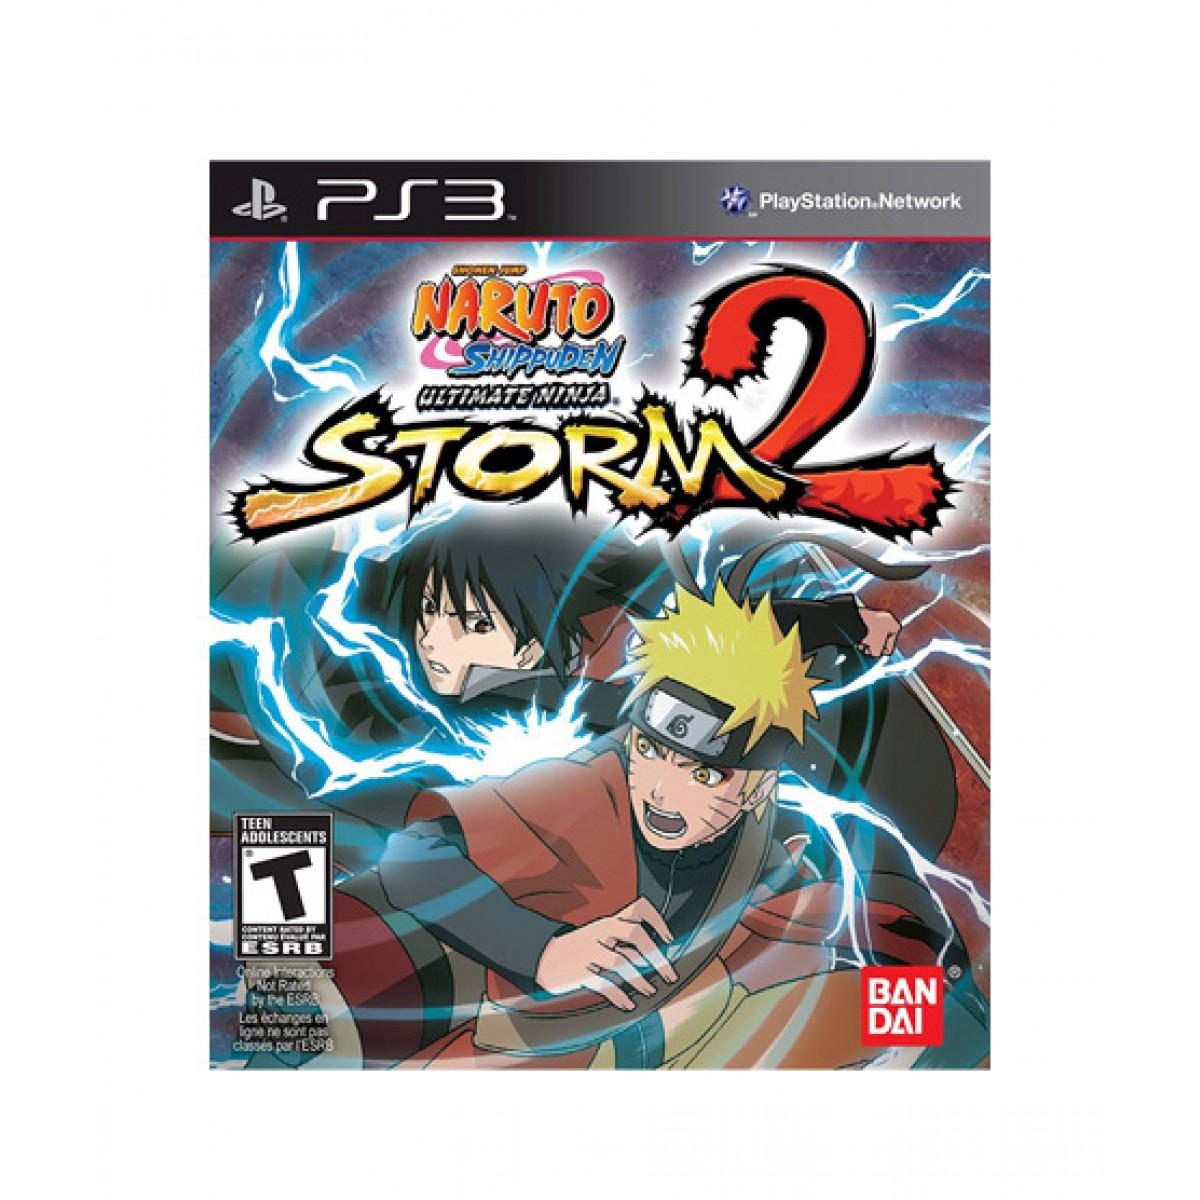 Naruto Shippuden: Ultimate Ninja Storm 2 Game For PS3